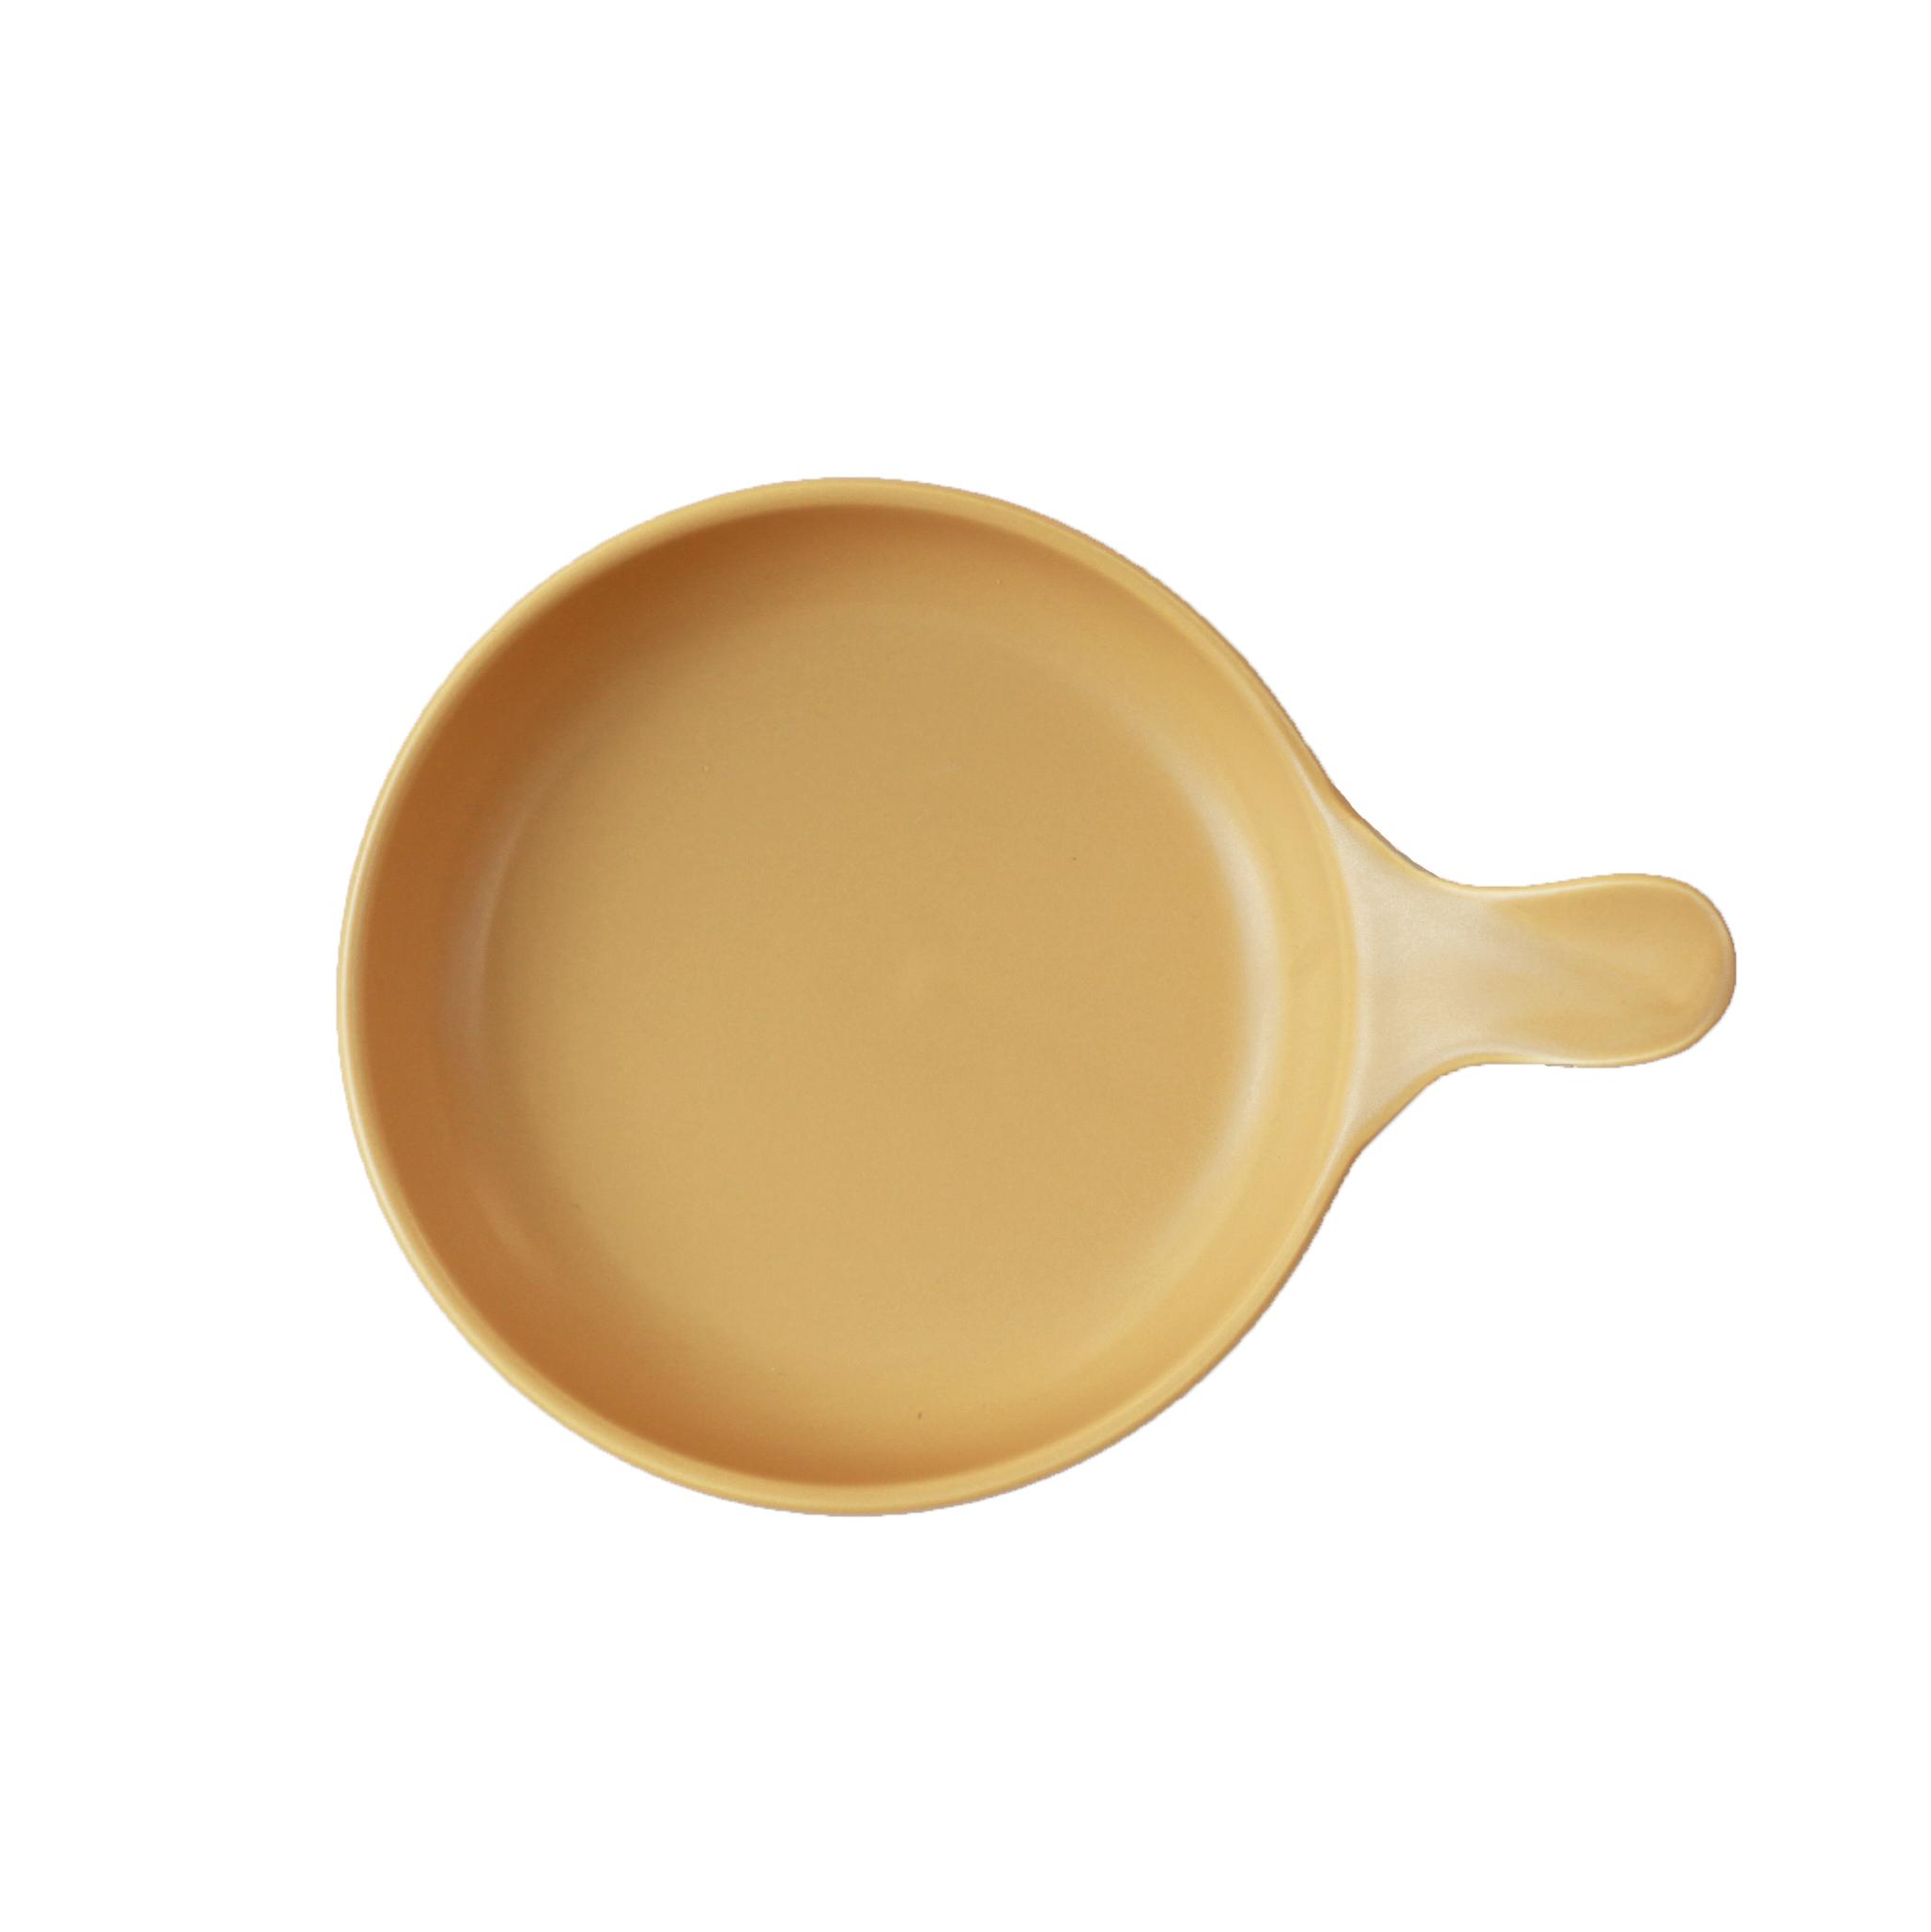 sowaca フライパンS 【イエロー】(耐熱陶器・プレート)